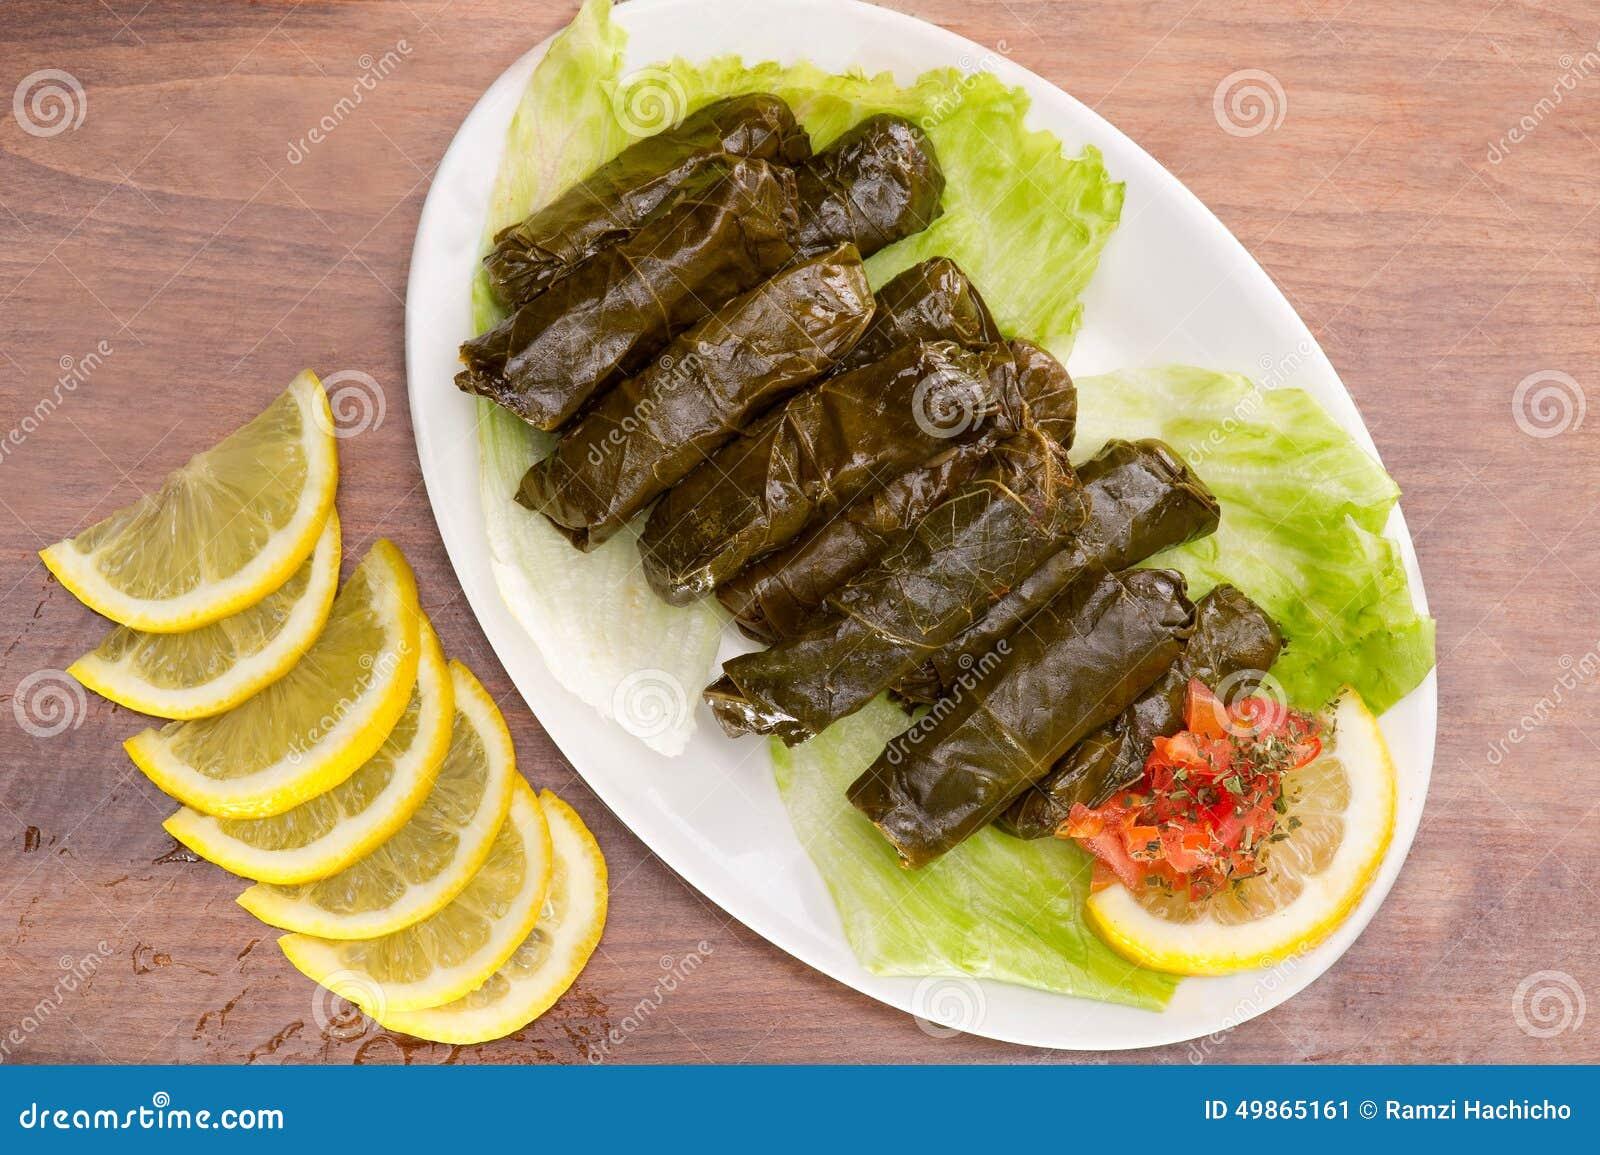 Foglie di vite farcite cucina libanese immagine stock for Cucina libanese